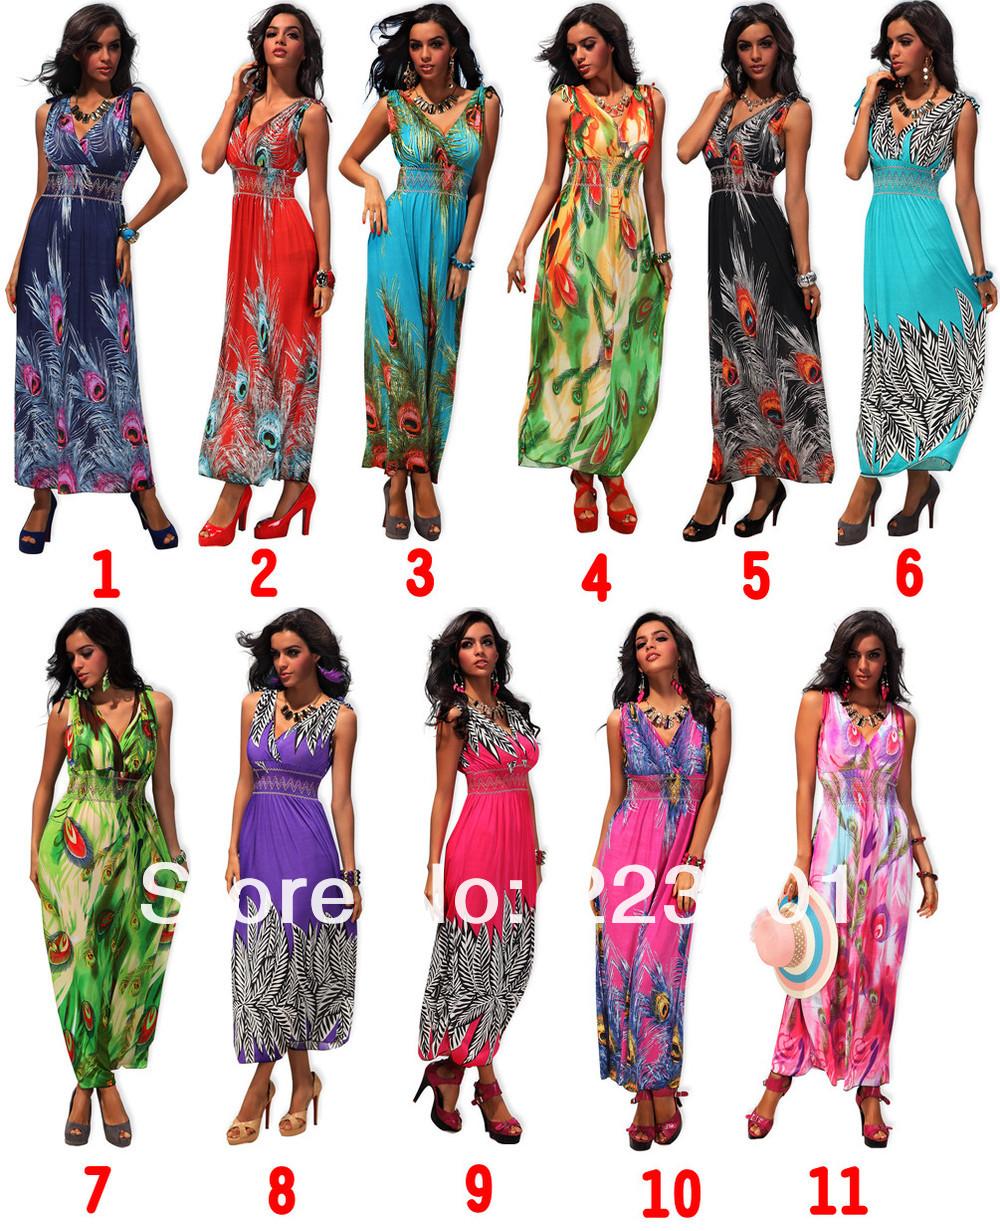 High waisted Www.aliexpress.com dresses